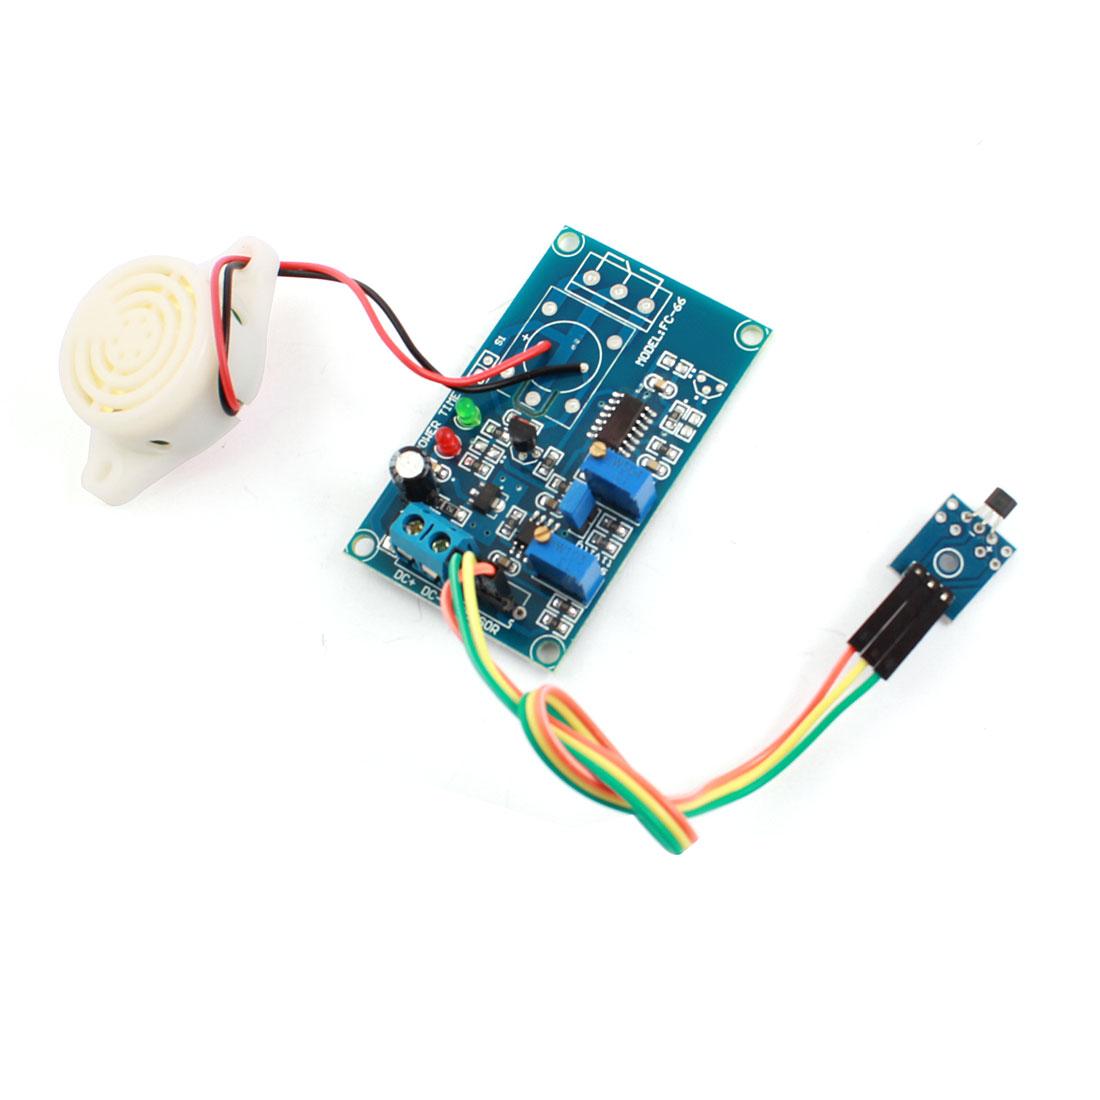 DC24V 0-20S Hall Effect Sensor Magnetic Detector Delay Buzzer PCB Board Circuit Module